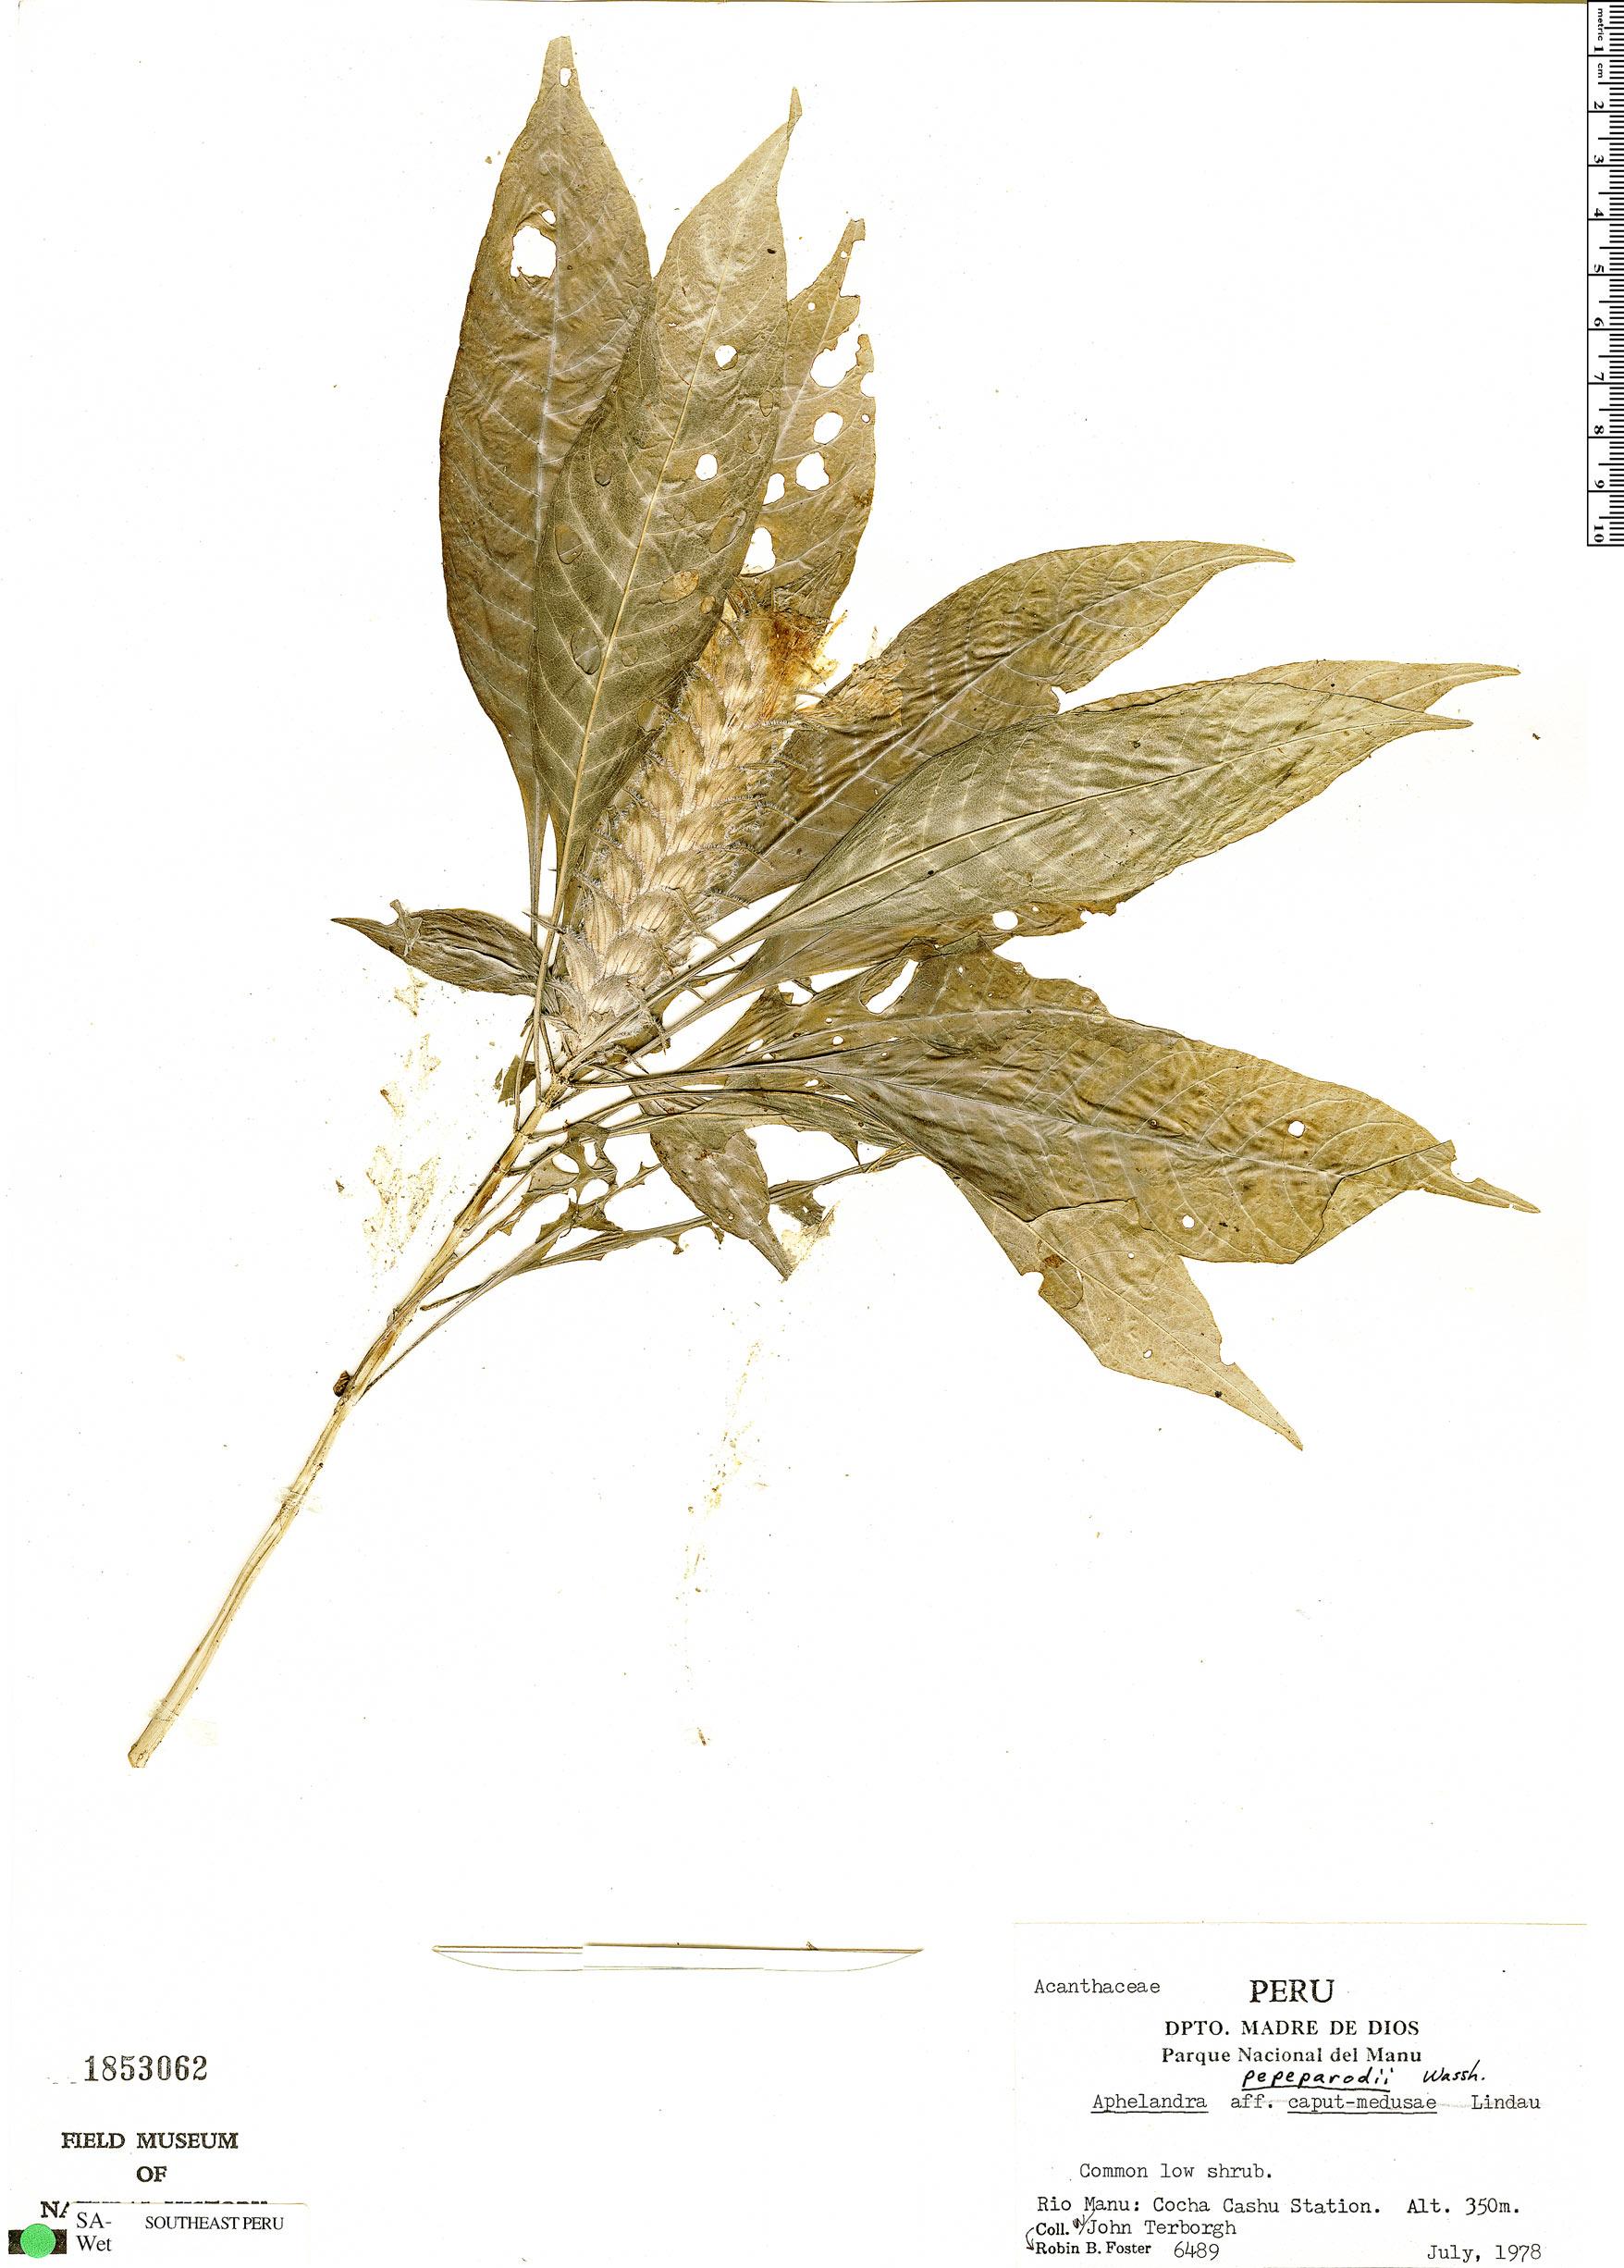 Specimen: Aphelandra pepe-parodii